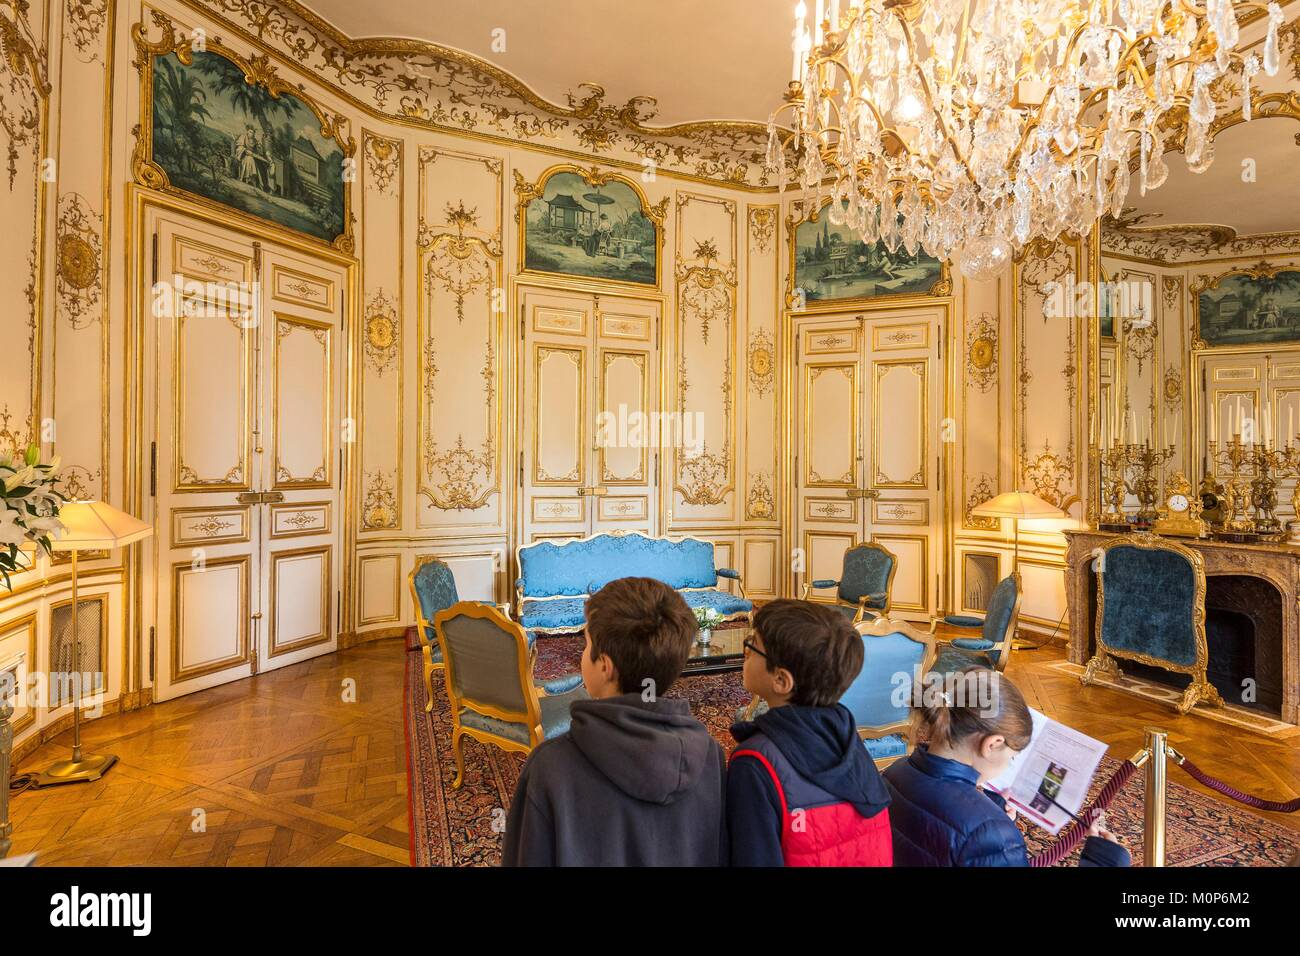 France,Paris,Heritage Days 2017,Hotel de Matignon,Prime Minister's Office,children visiting the Blue Room - Stock Image